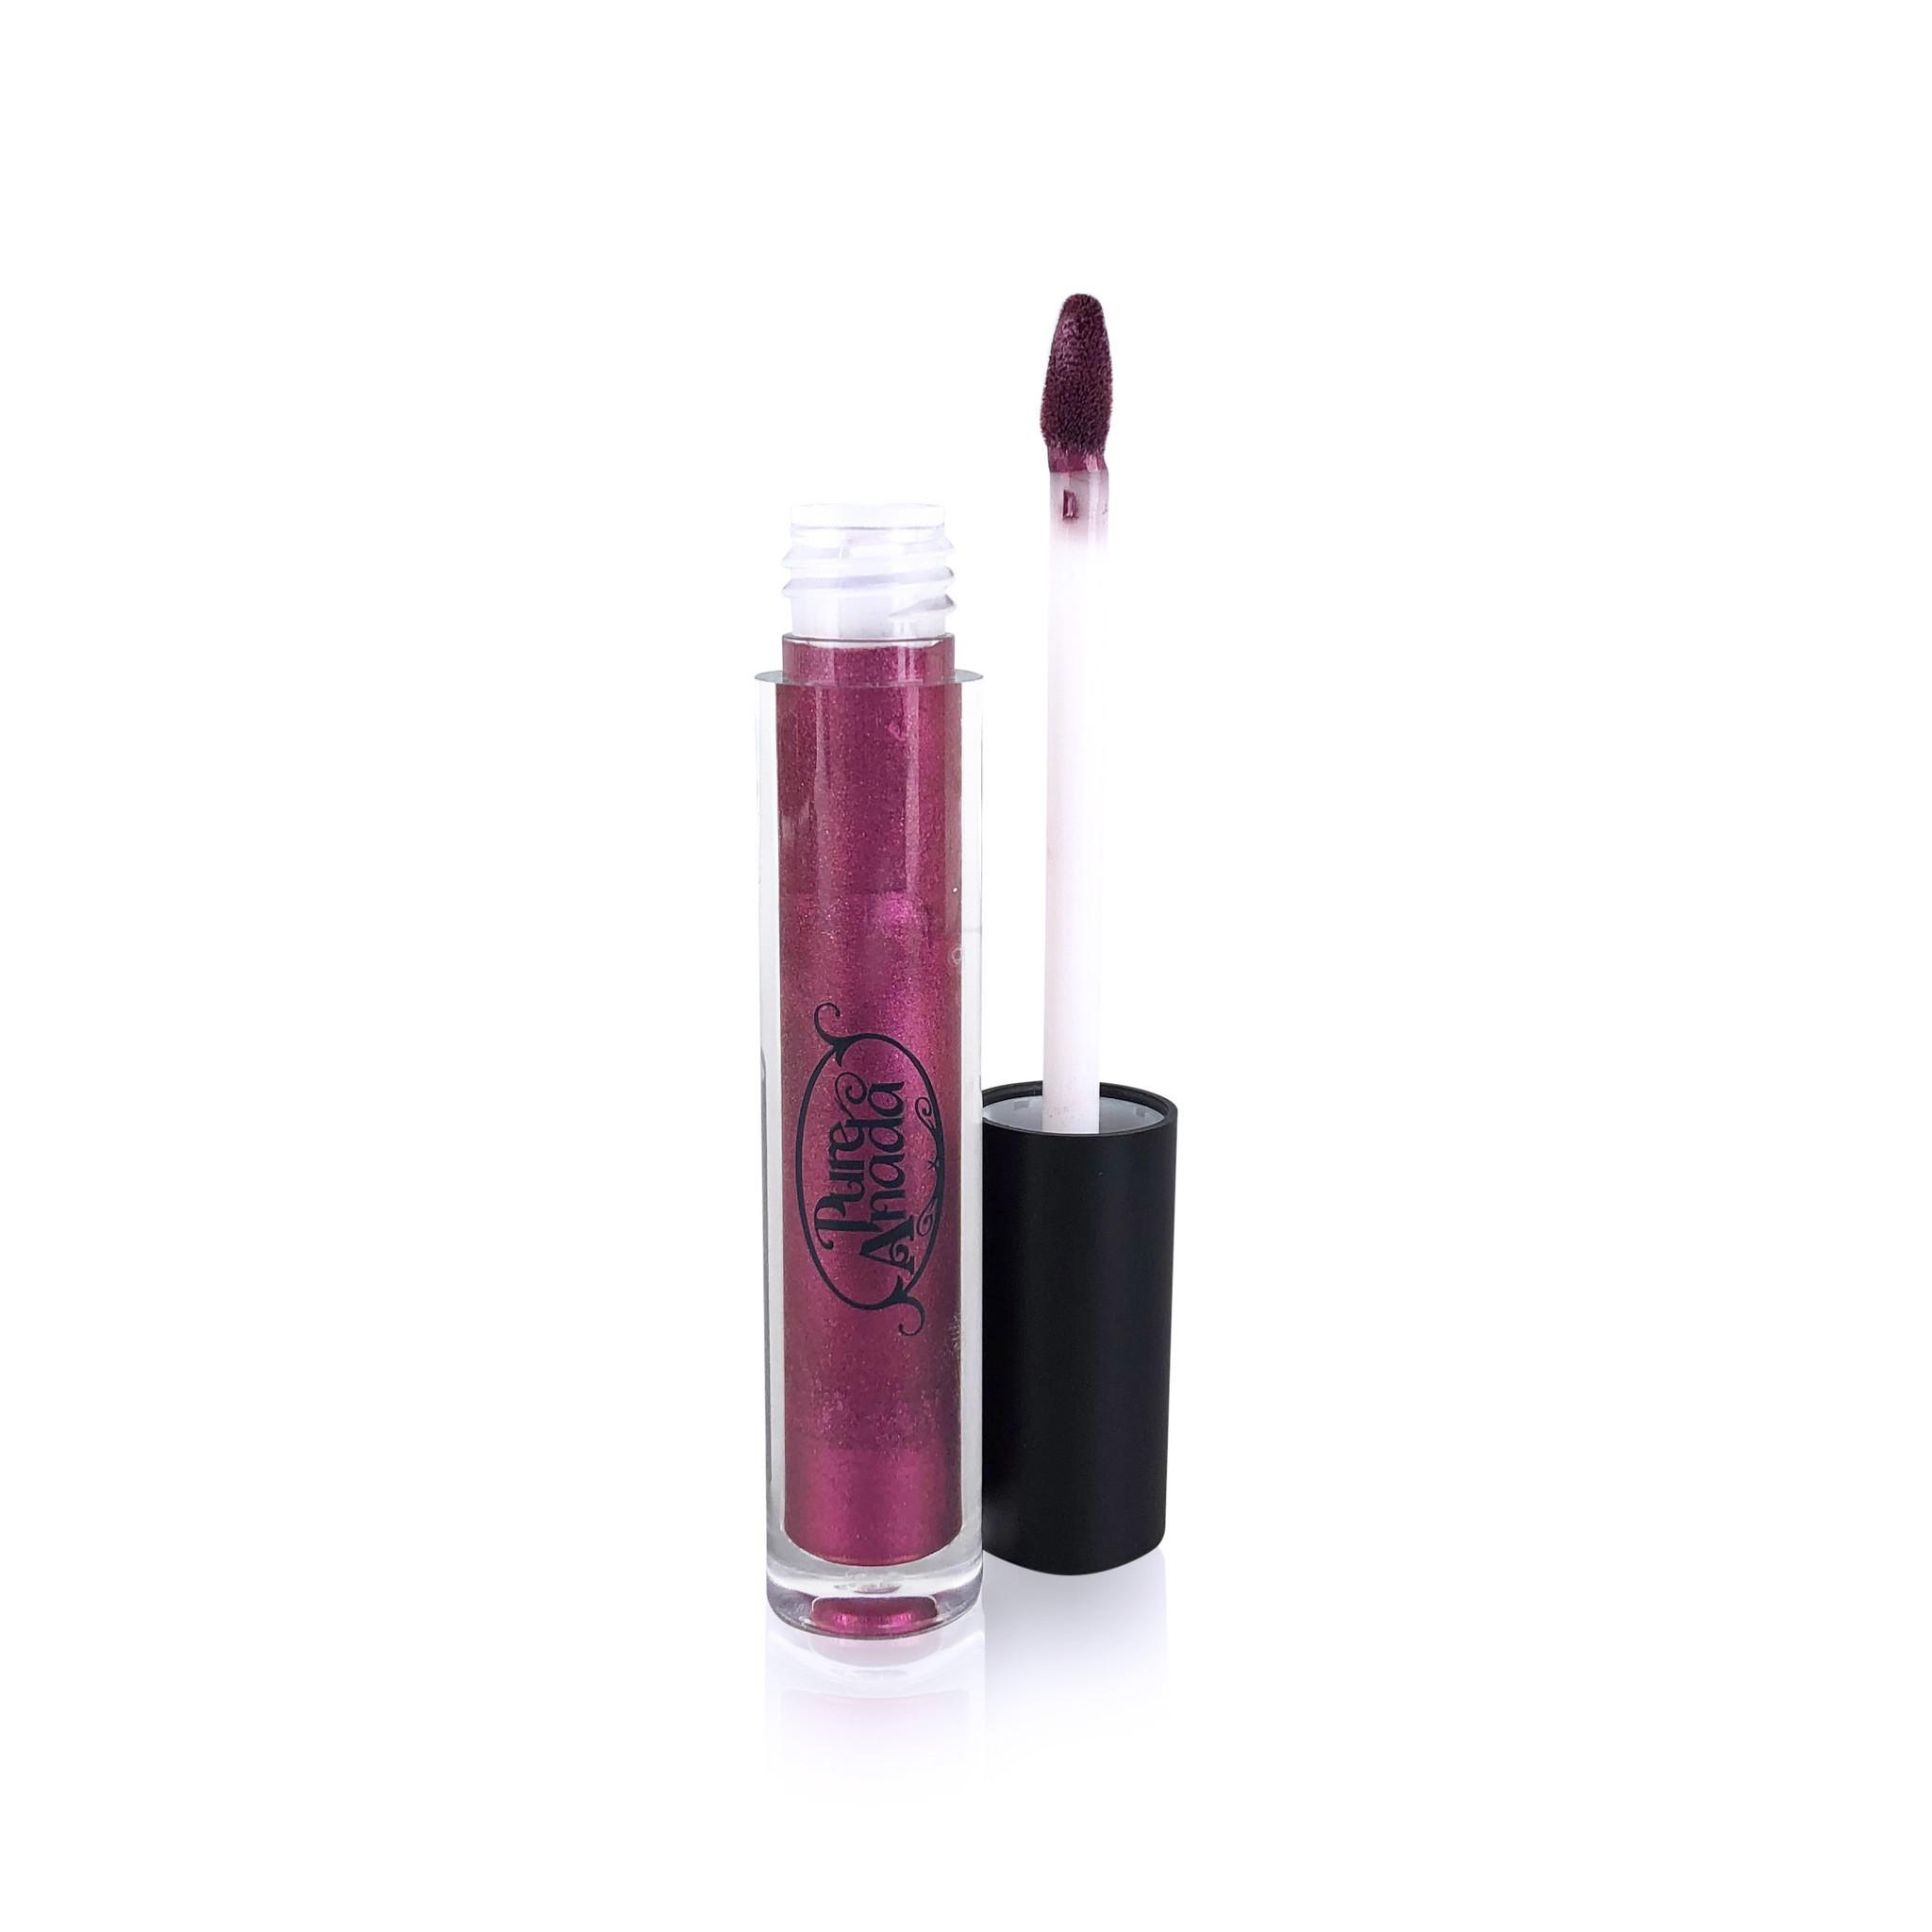 Glisten Mineral Lip Gloss - Tourmaline-2